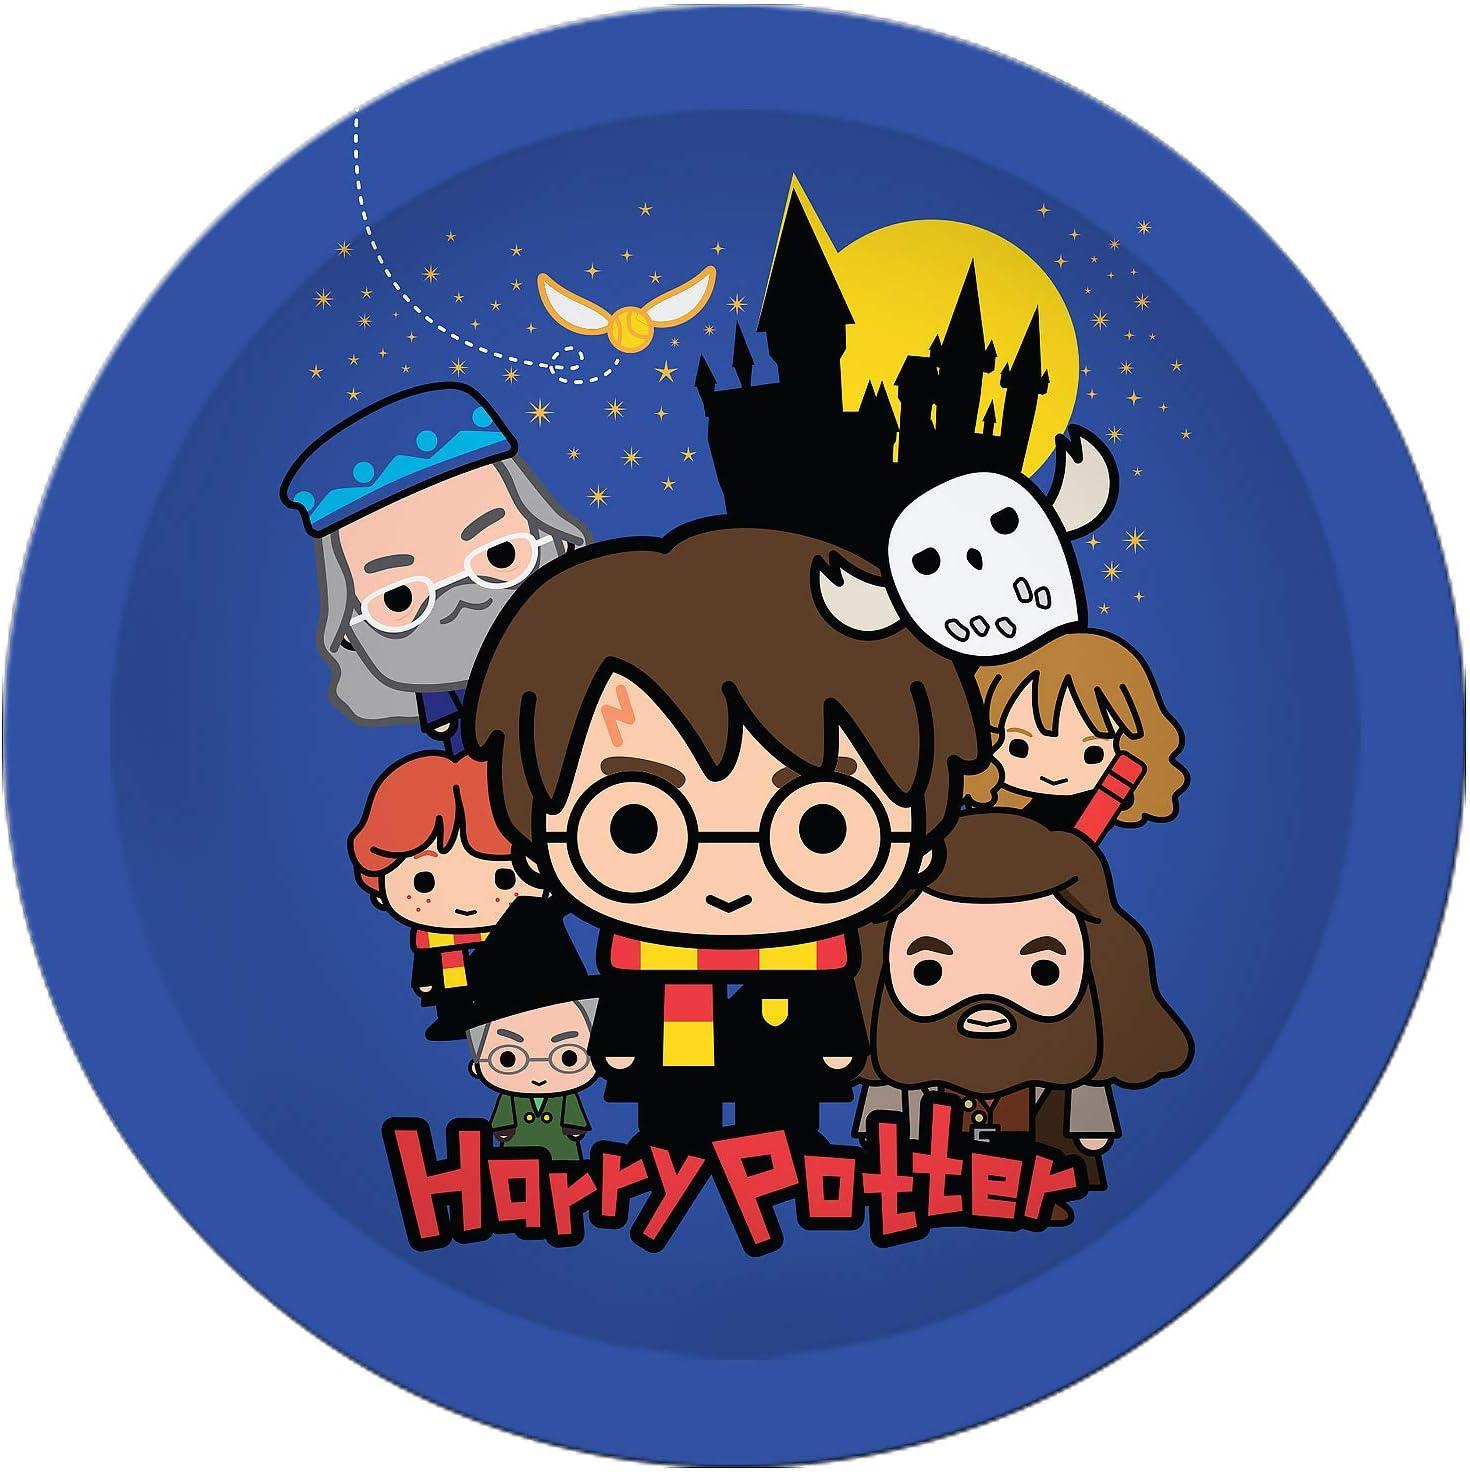 Silver Buffalo Harry Potter Chibi Party Tableware Set, 60-Piece, Blue, 60 Piece